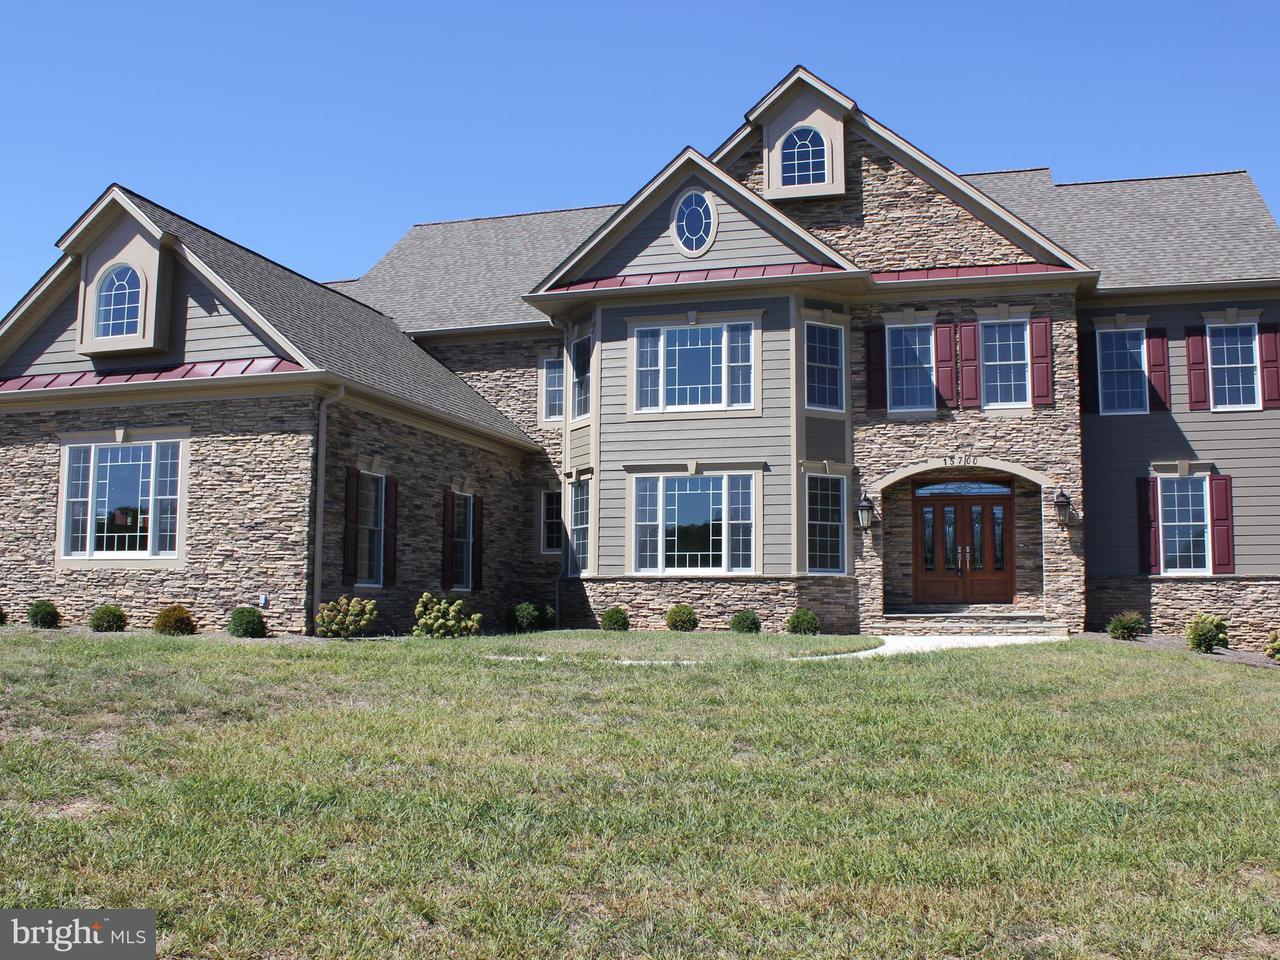 Single Family Home for Sale at 15700 Hunton Lane 15700 Hunton Lane Haymarket, Virginia 20169 United States